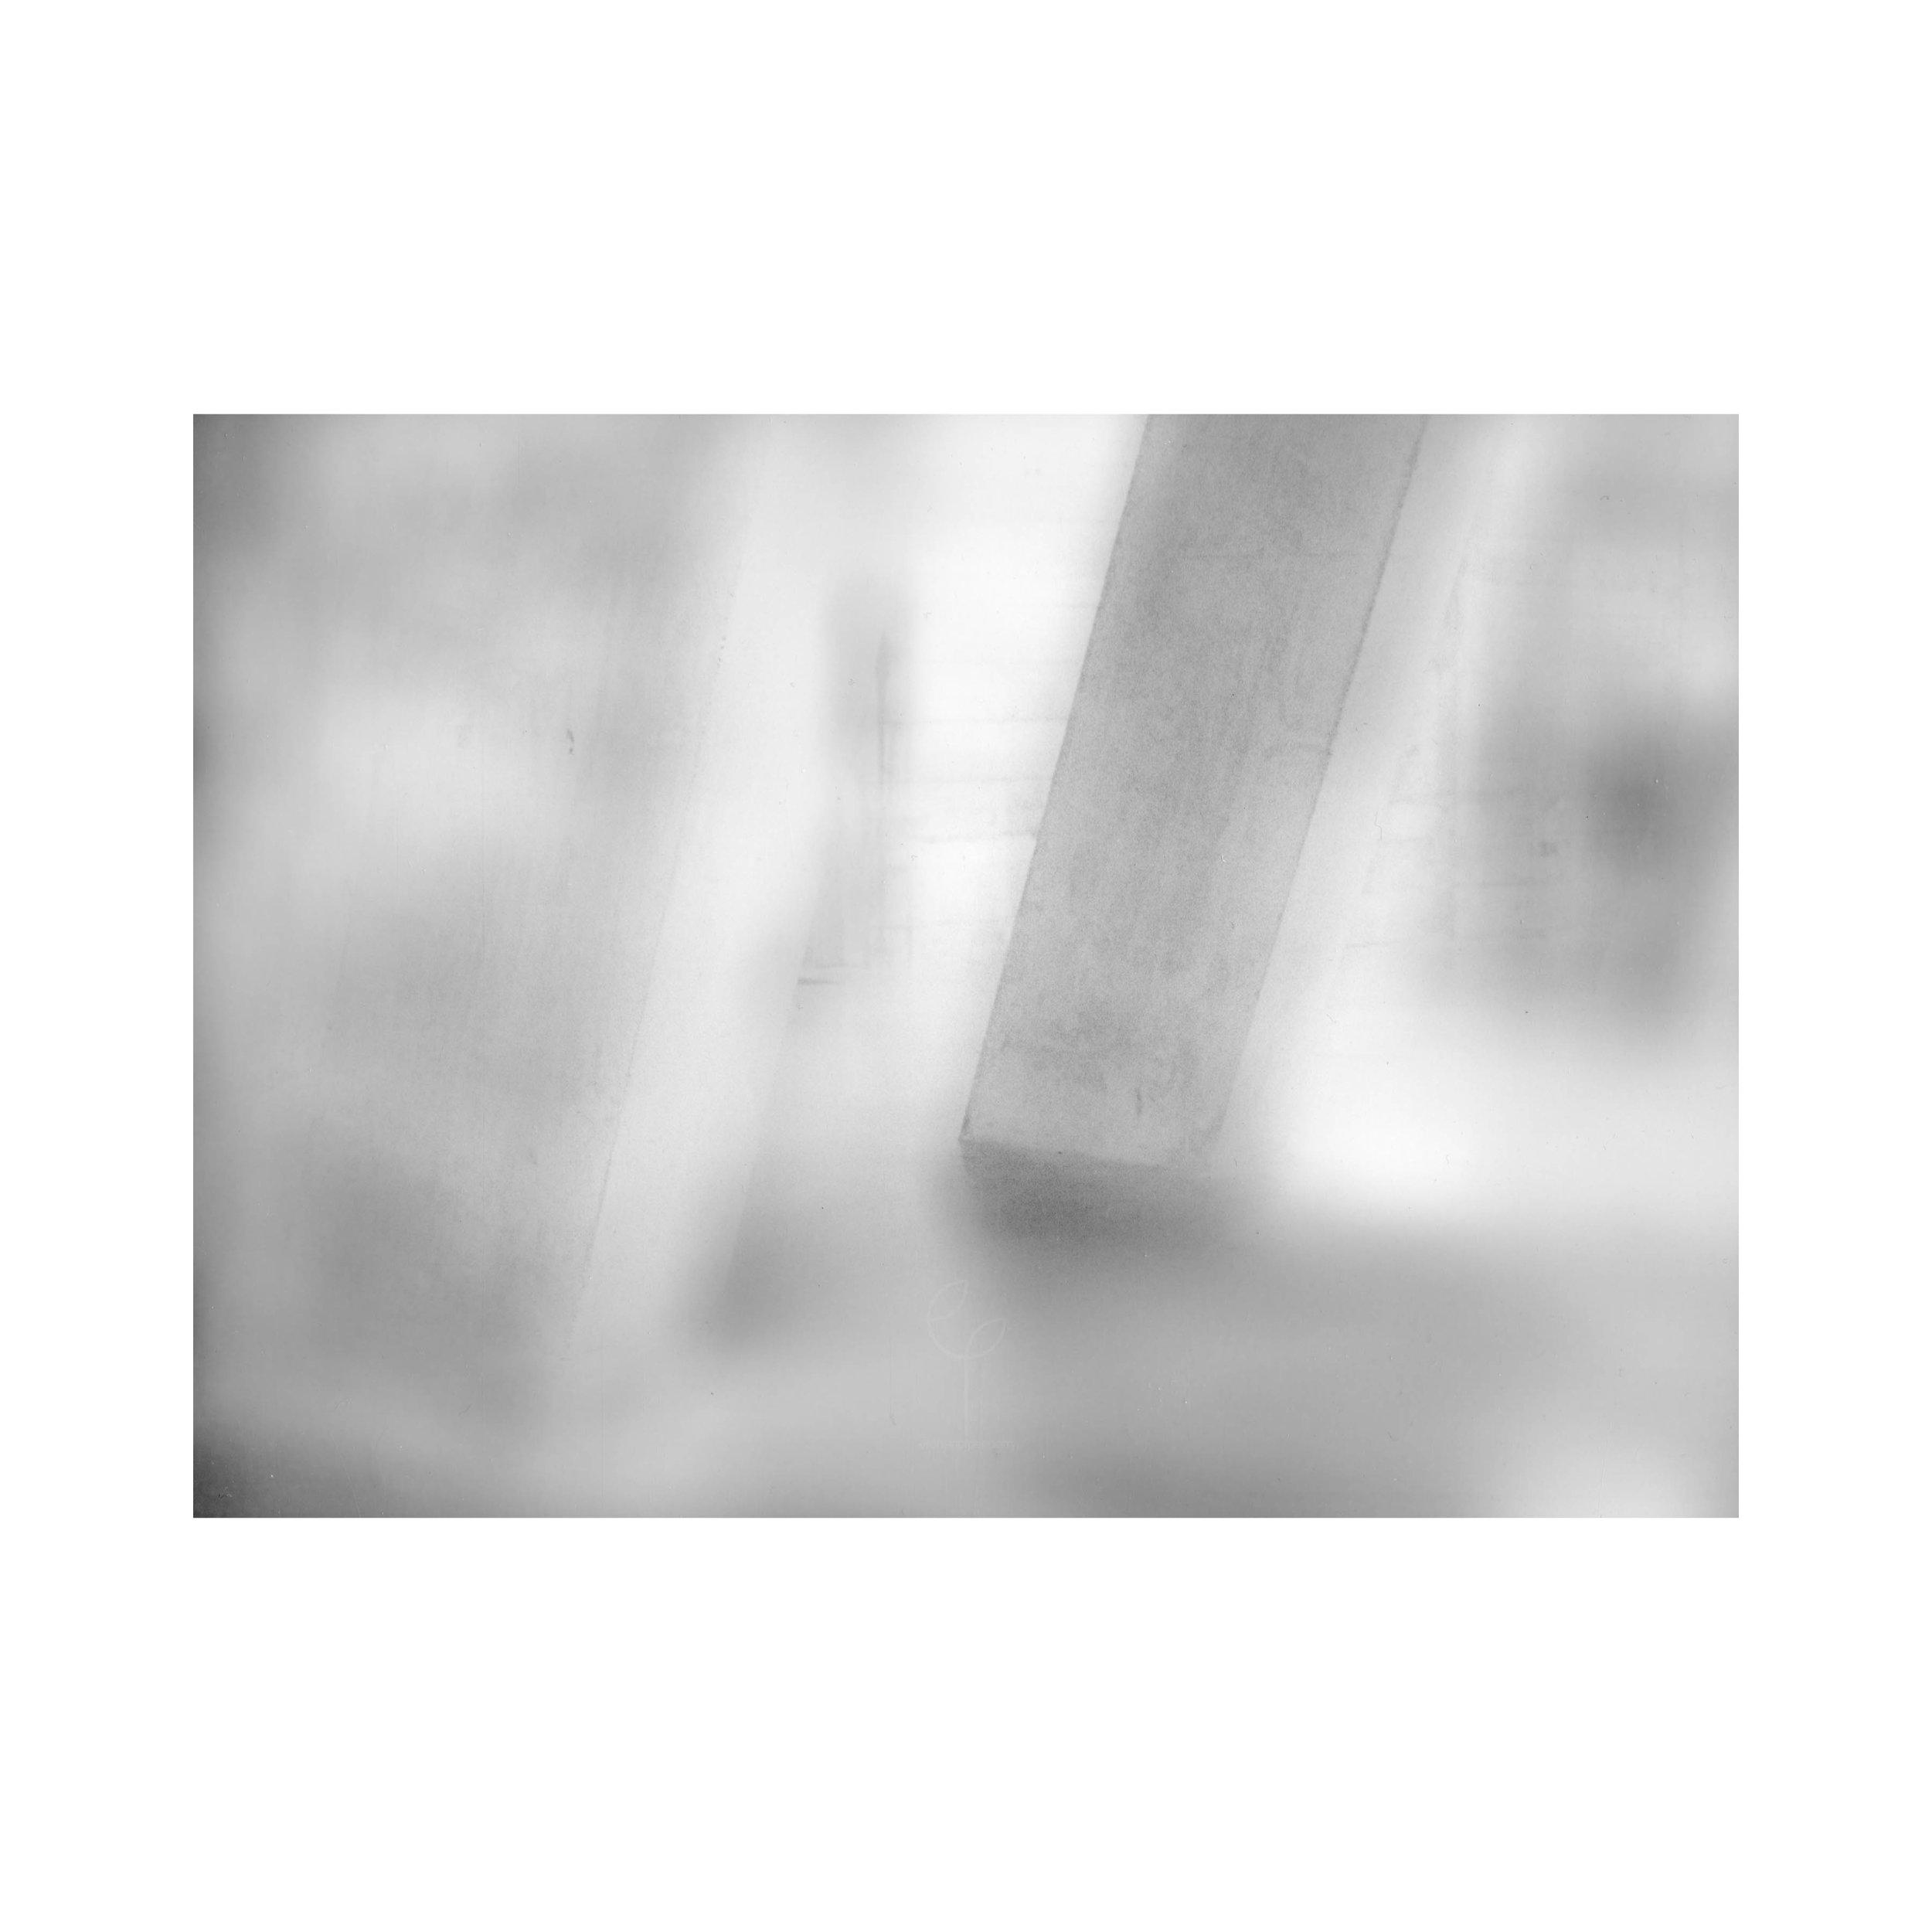 Square Watermarked-043.jpg